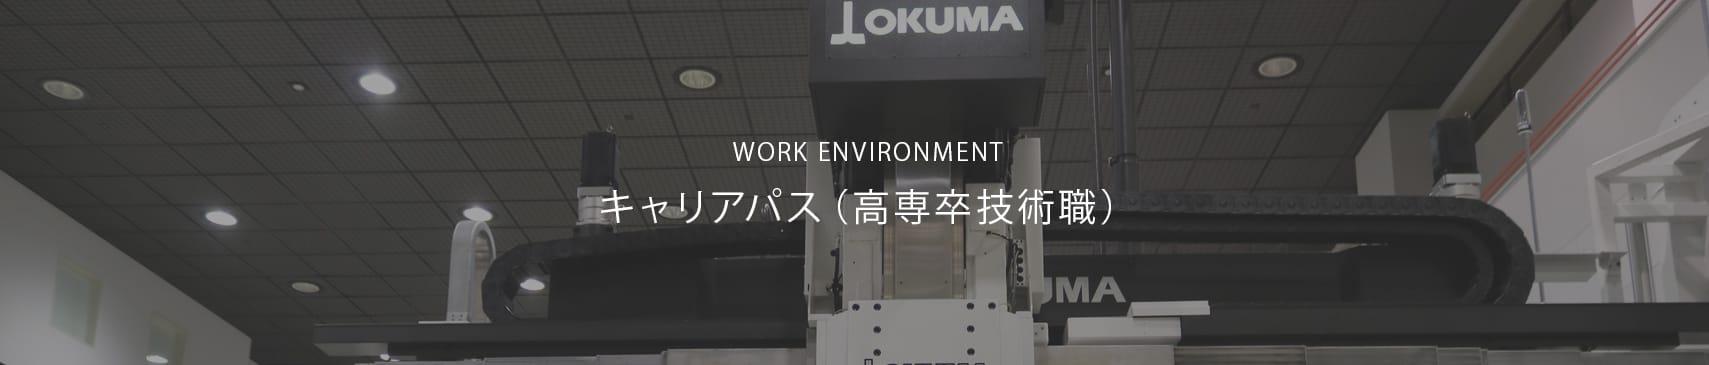 WORK ENVRONMENT キャリアパス(高専卒技術職)